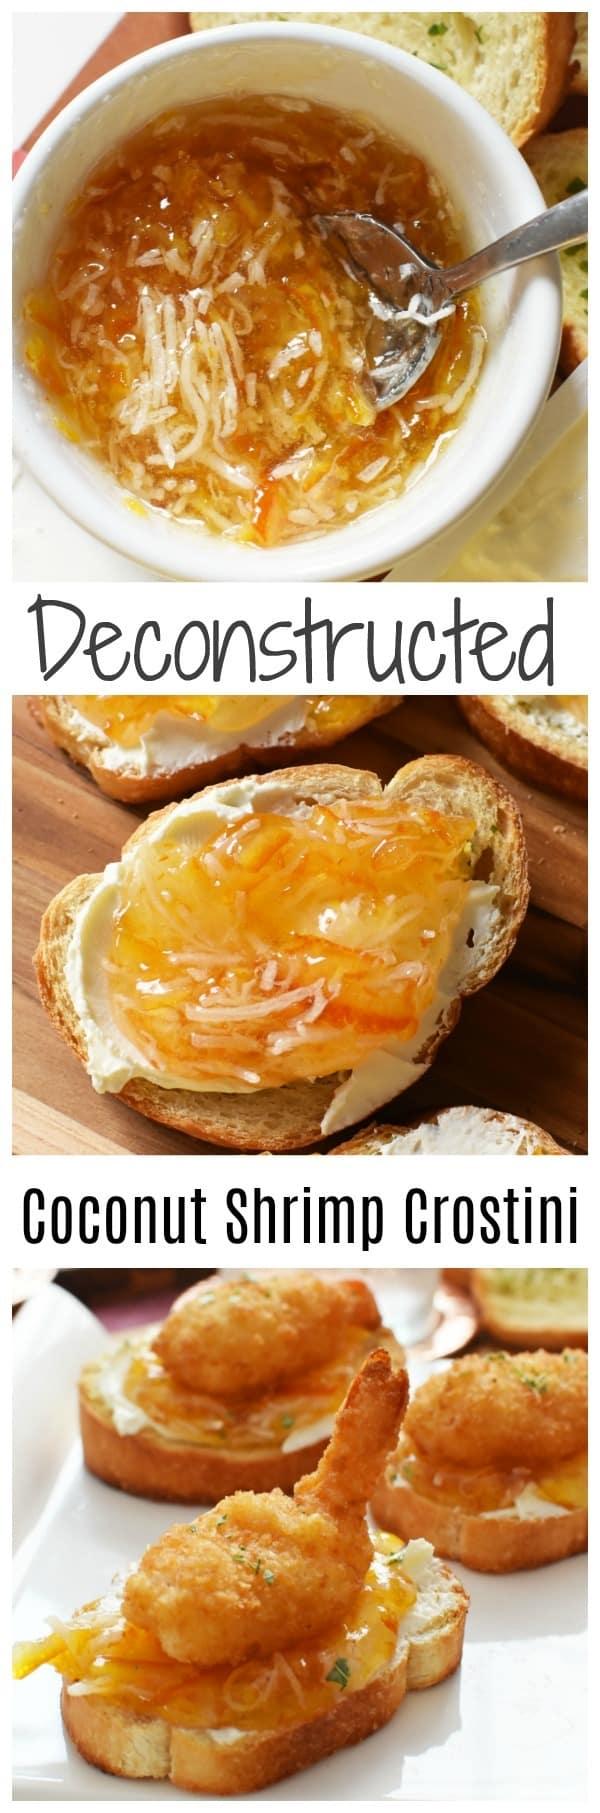 Easy Appetizer- Deconstructed Coconut Shrimp Crostini